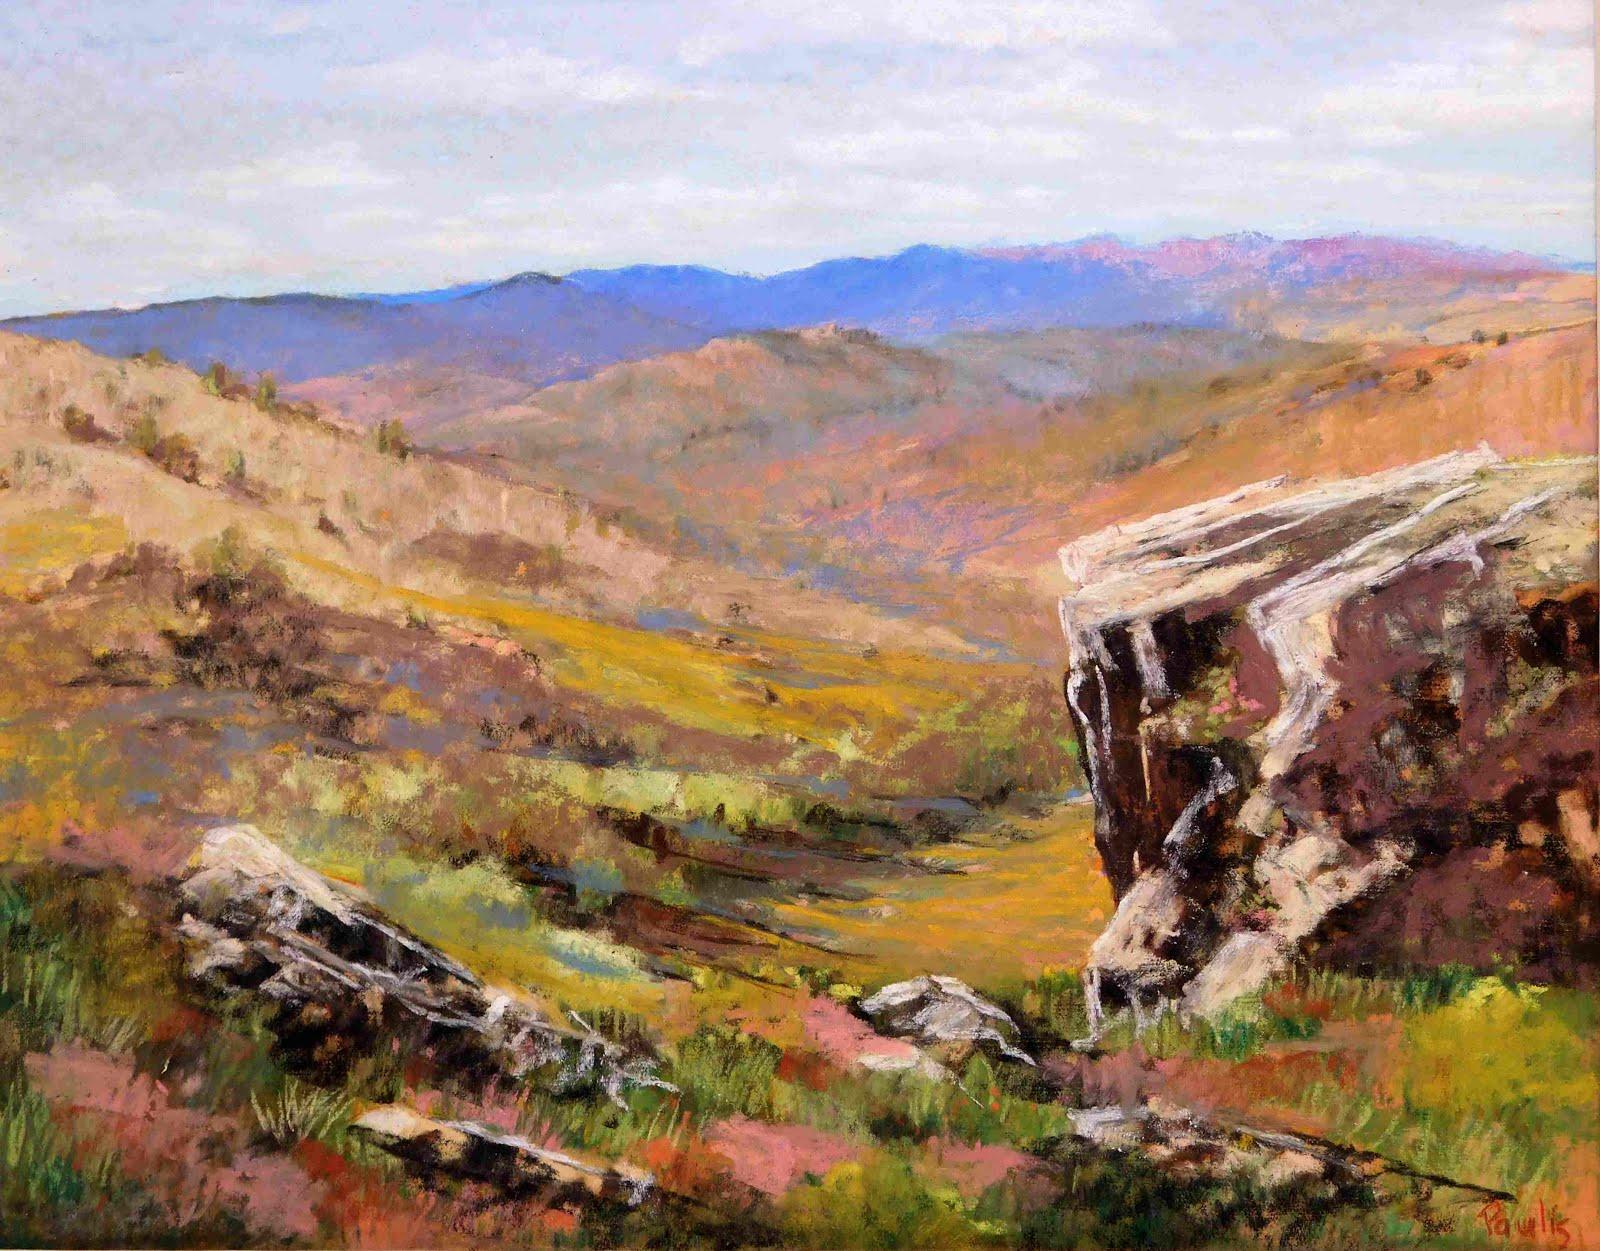 Spring Day Lagomarsino Canyon